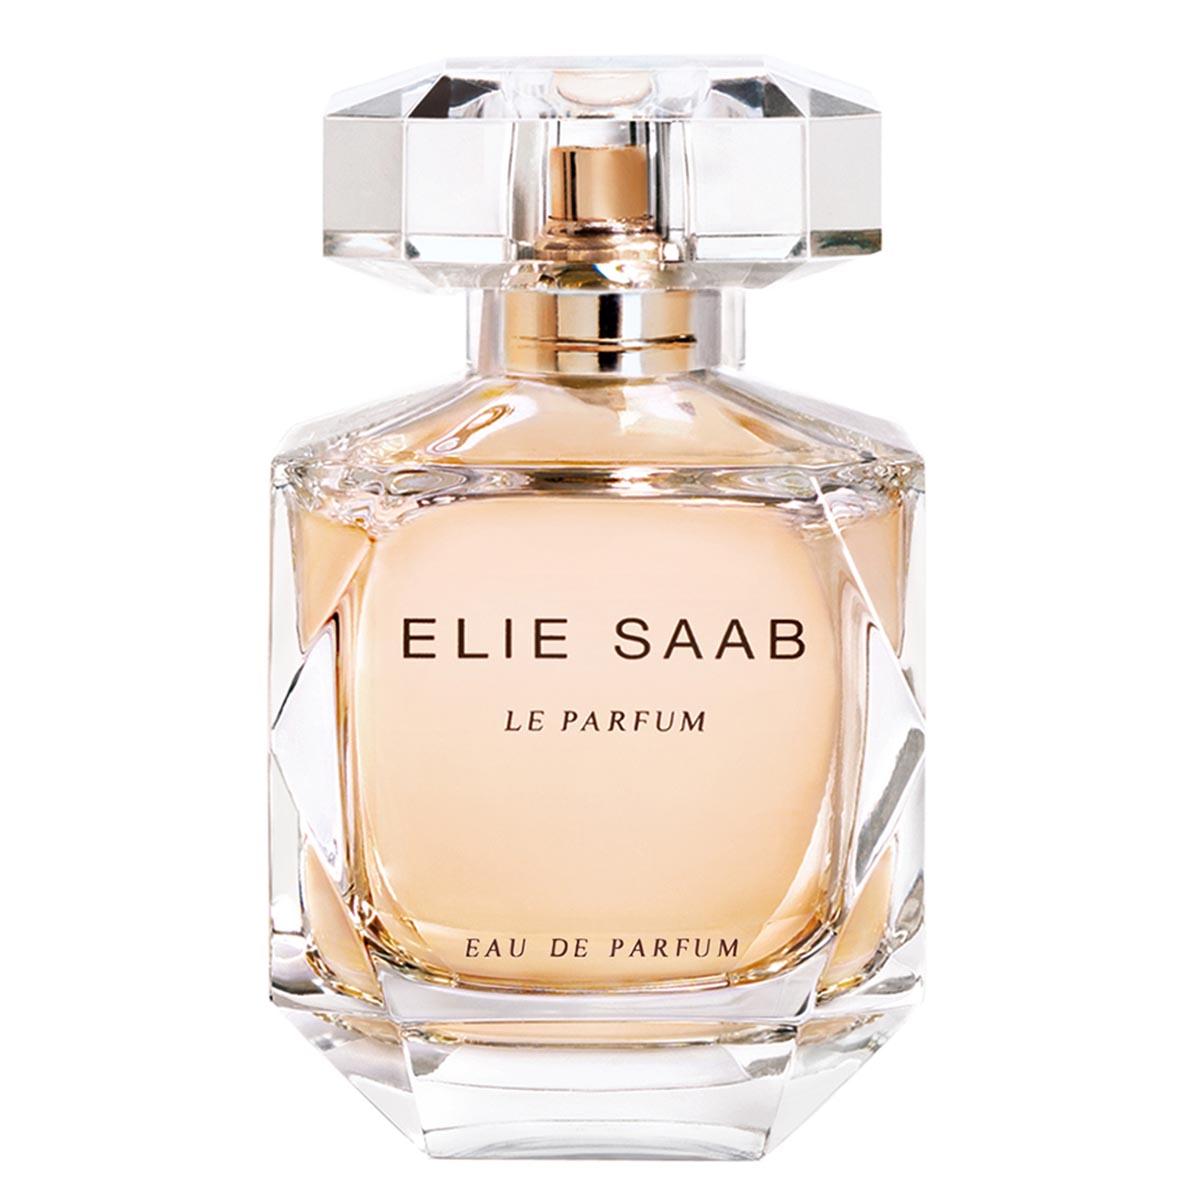 Elie saab eau de parfum 30ml vaporizador